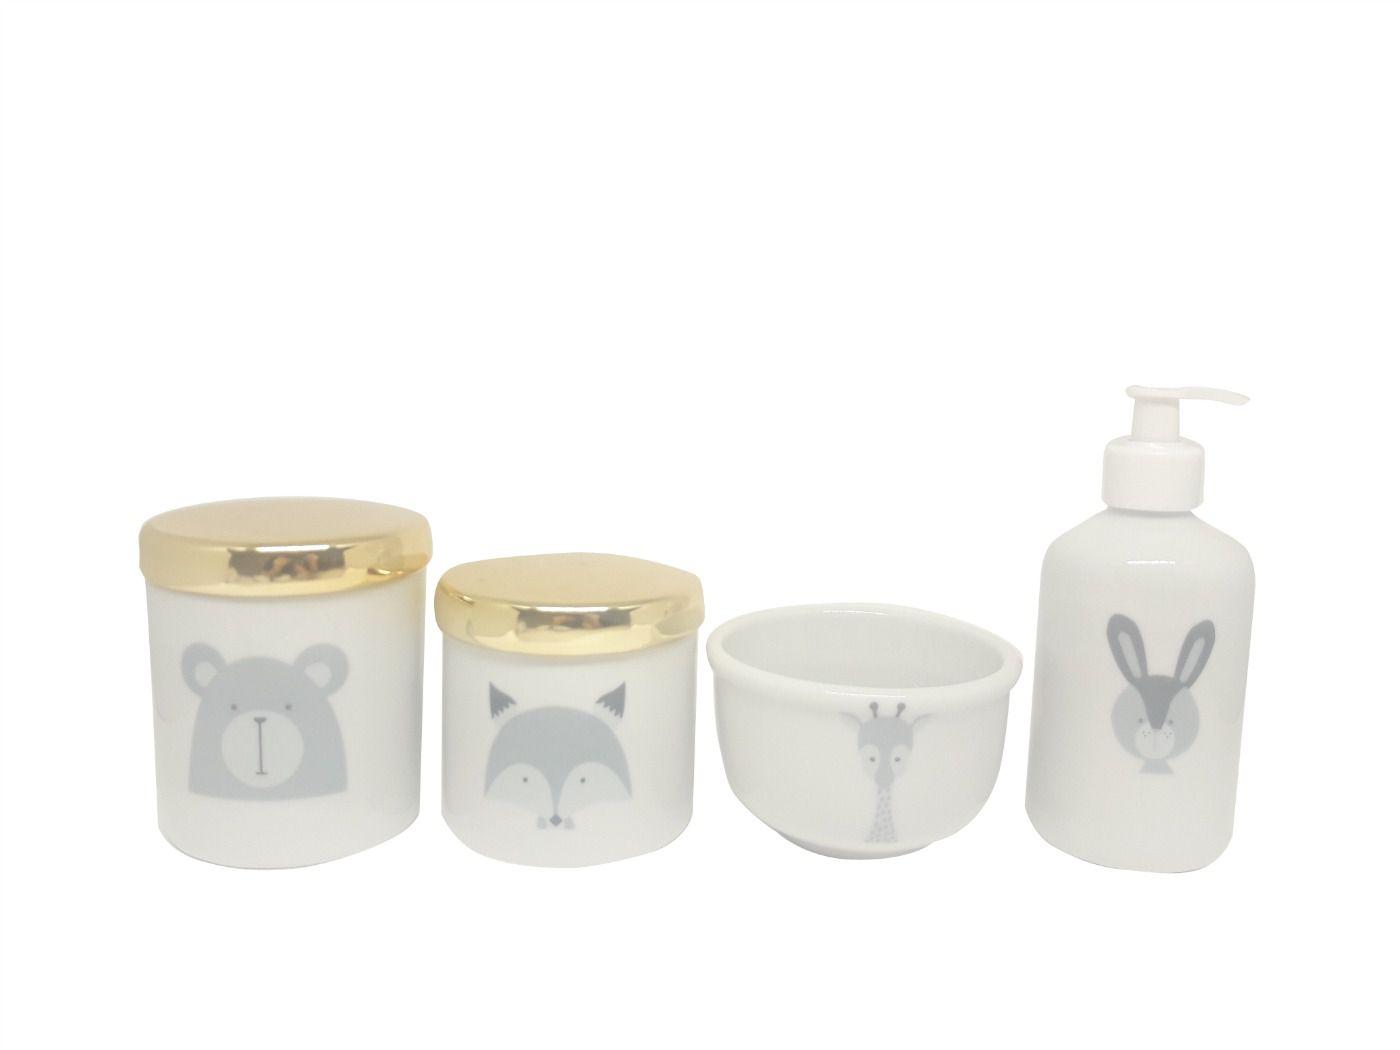 Kit Higiene Bebê Porcelana Escandinavo |Urso & Raposa & Coelho & Girafa | Tampas Douradas